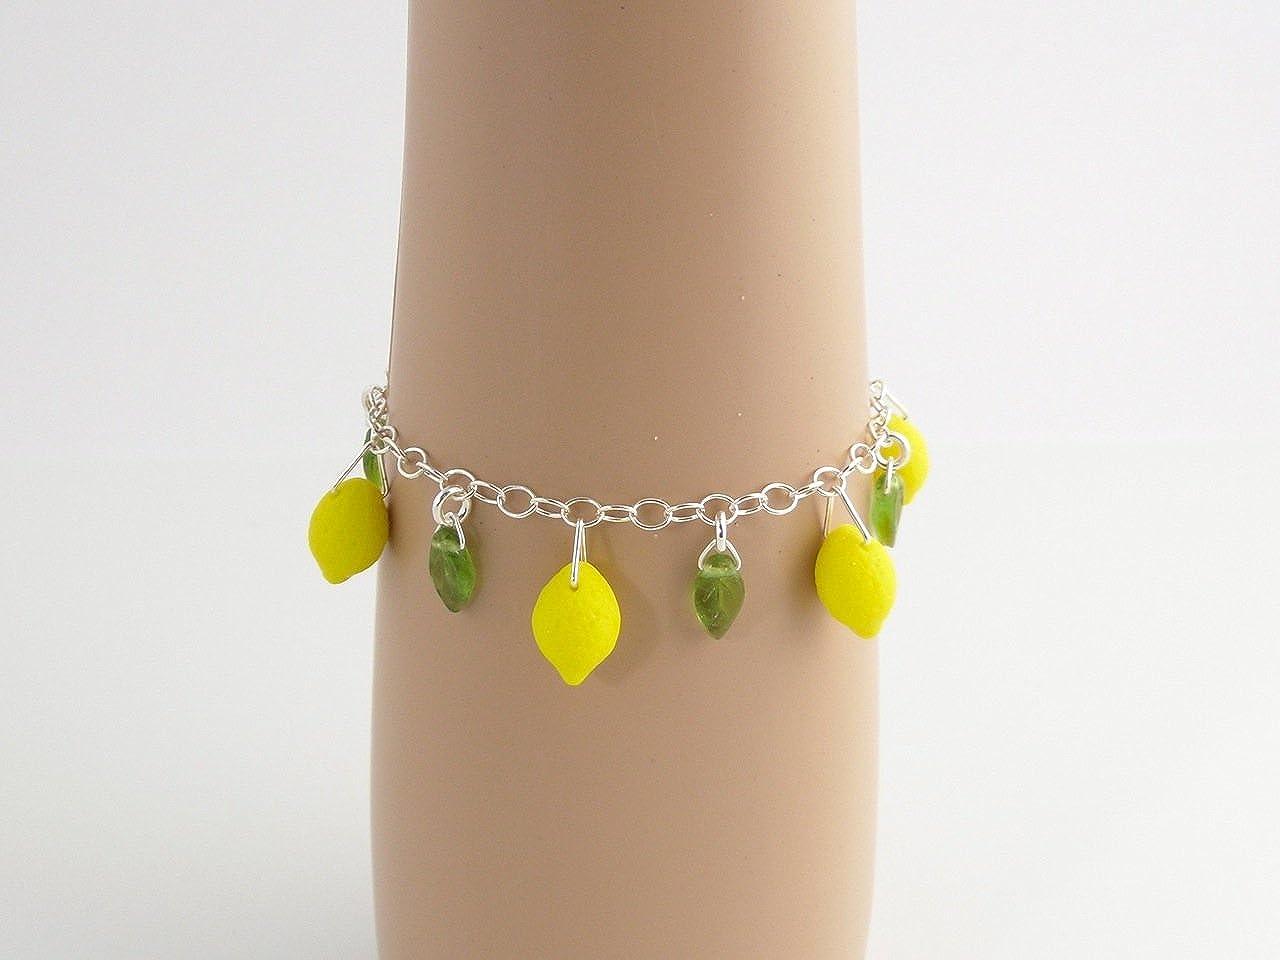 Sterling Silver Chain Lemon Grove Bracelet Size XS-XL Czech Glass Yellow Lemons and Green Leaves